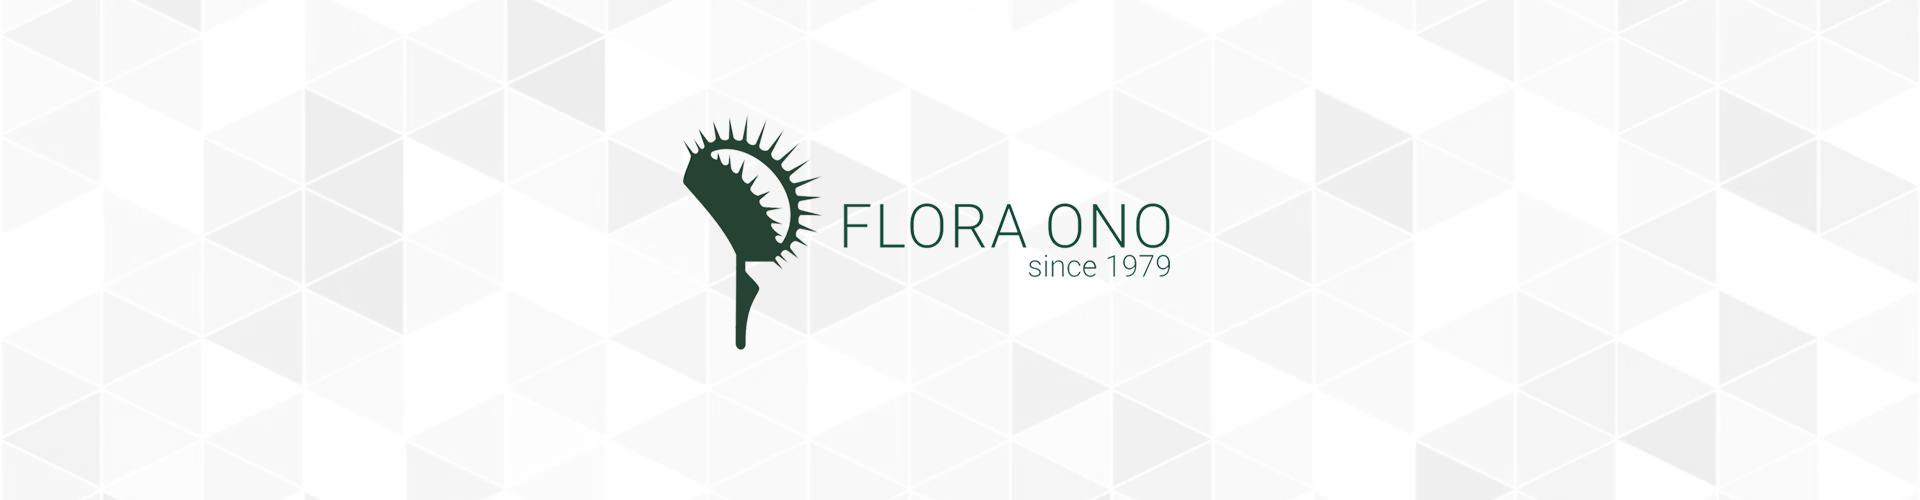 Flora Ono Logo